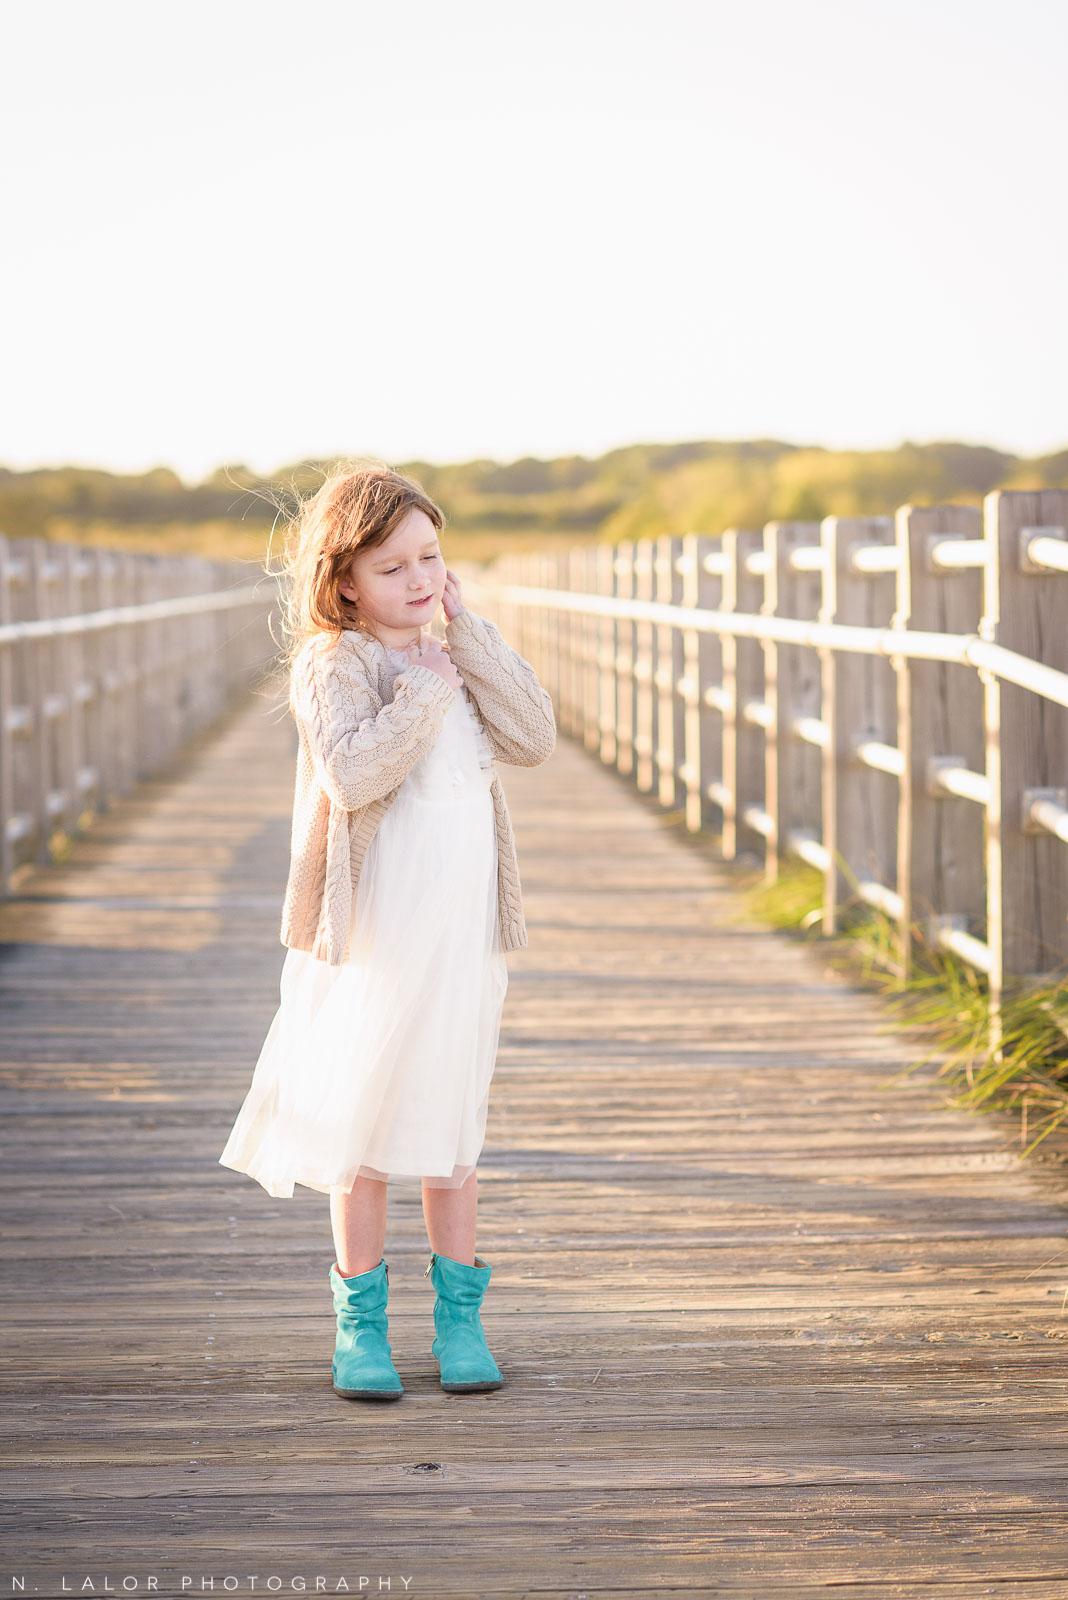 nlalor-photography-2015-10-04-gwen-beach-session-7.jpg